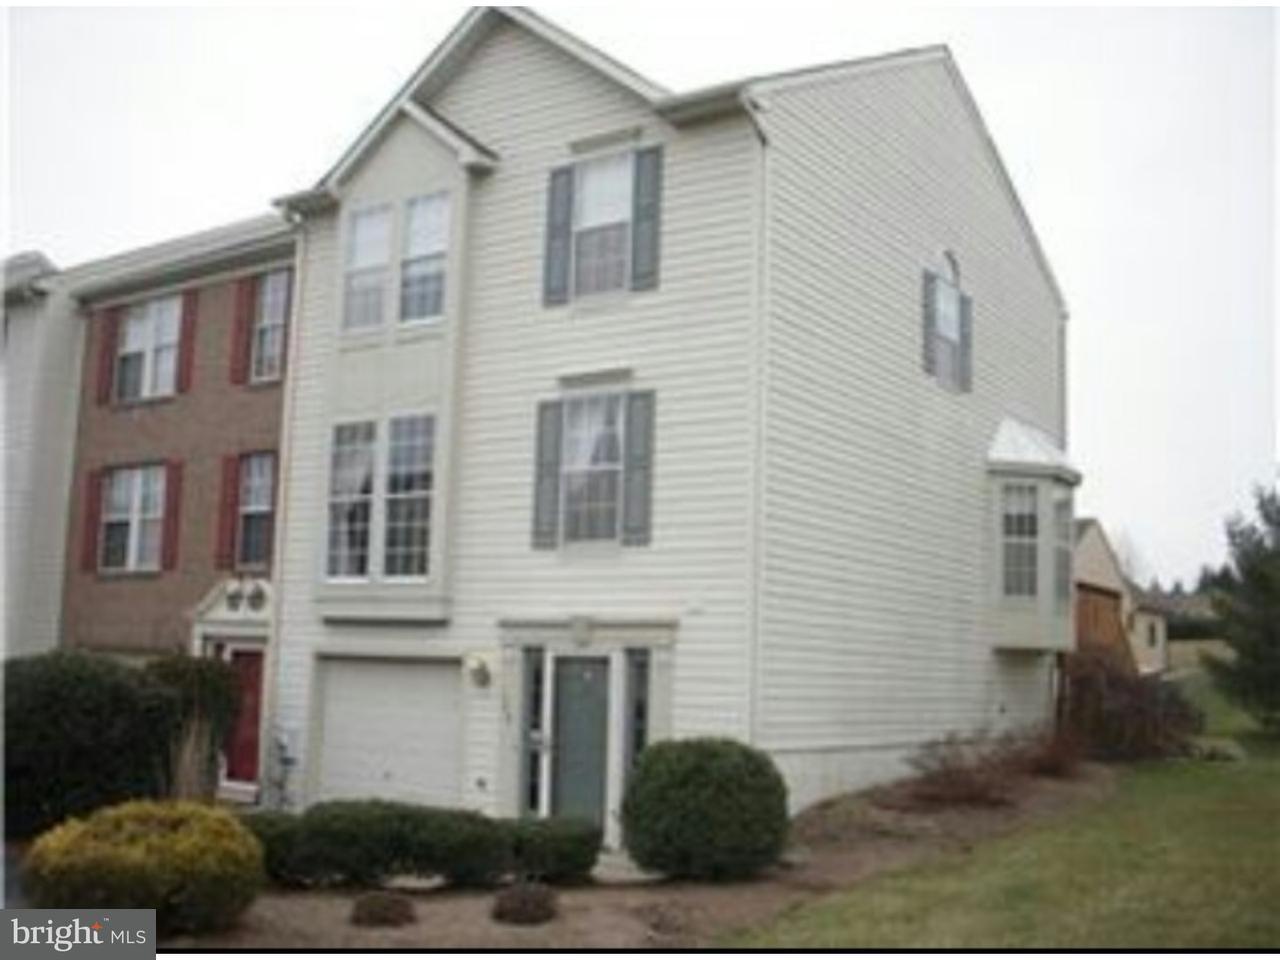 108 Steven Ln For Rent - Wilmington, DE | Trulia